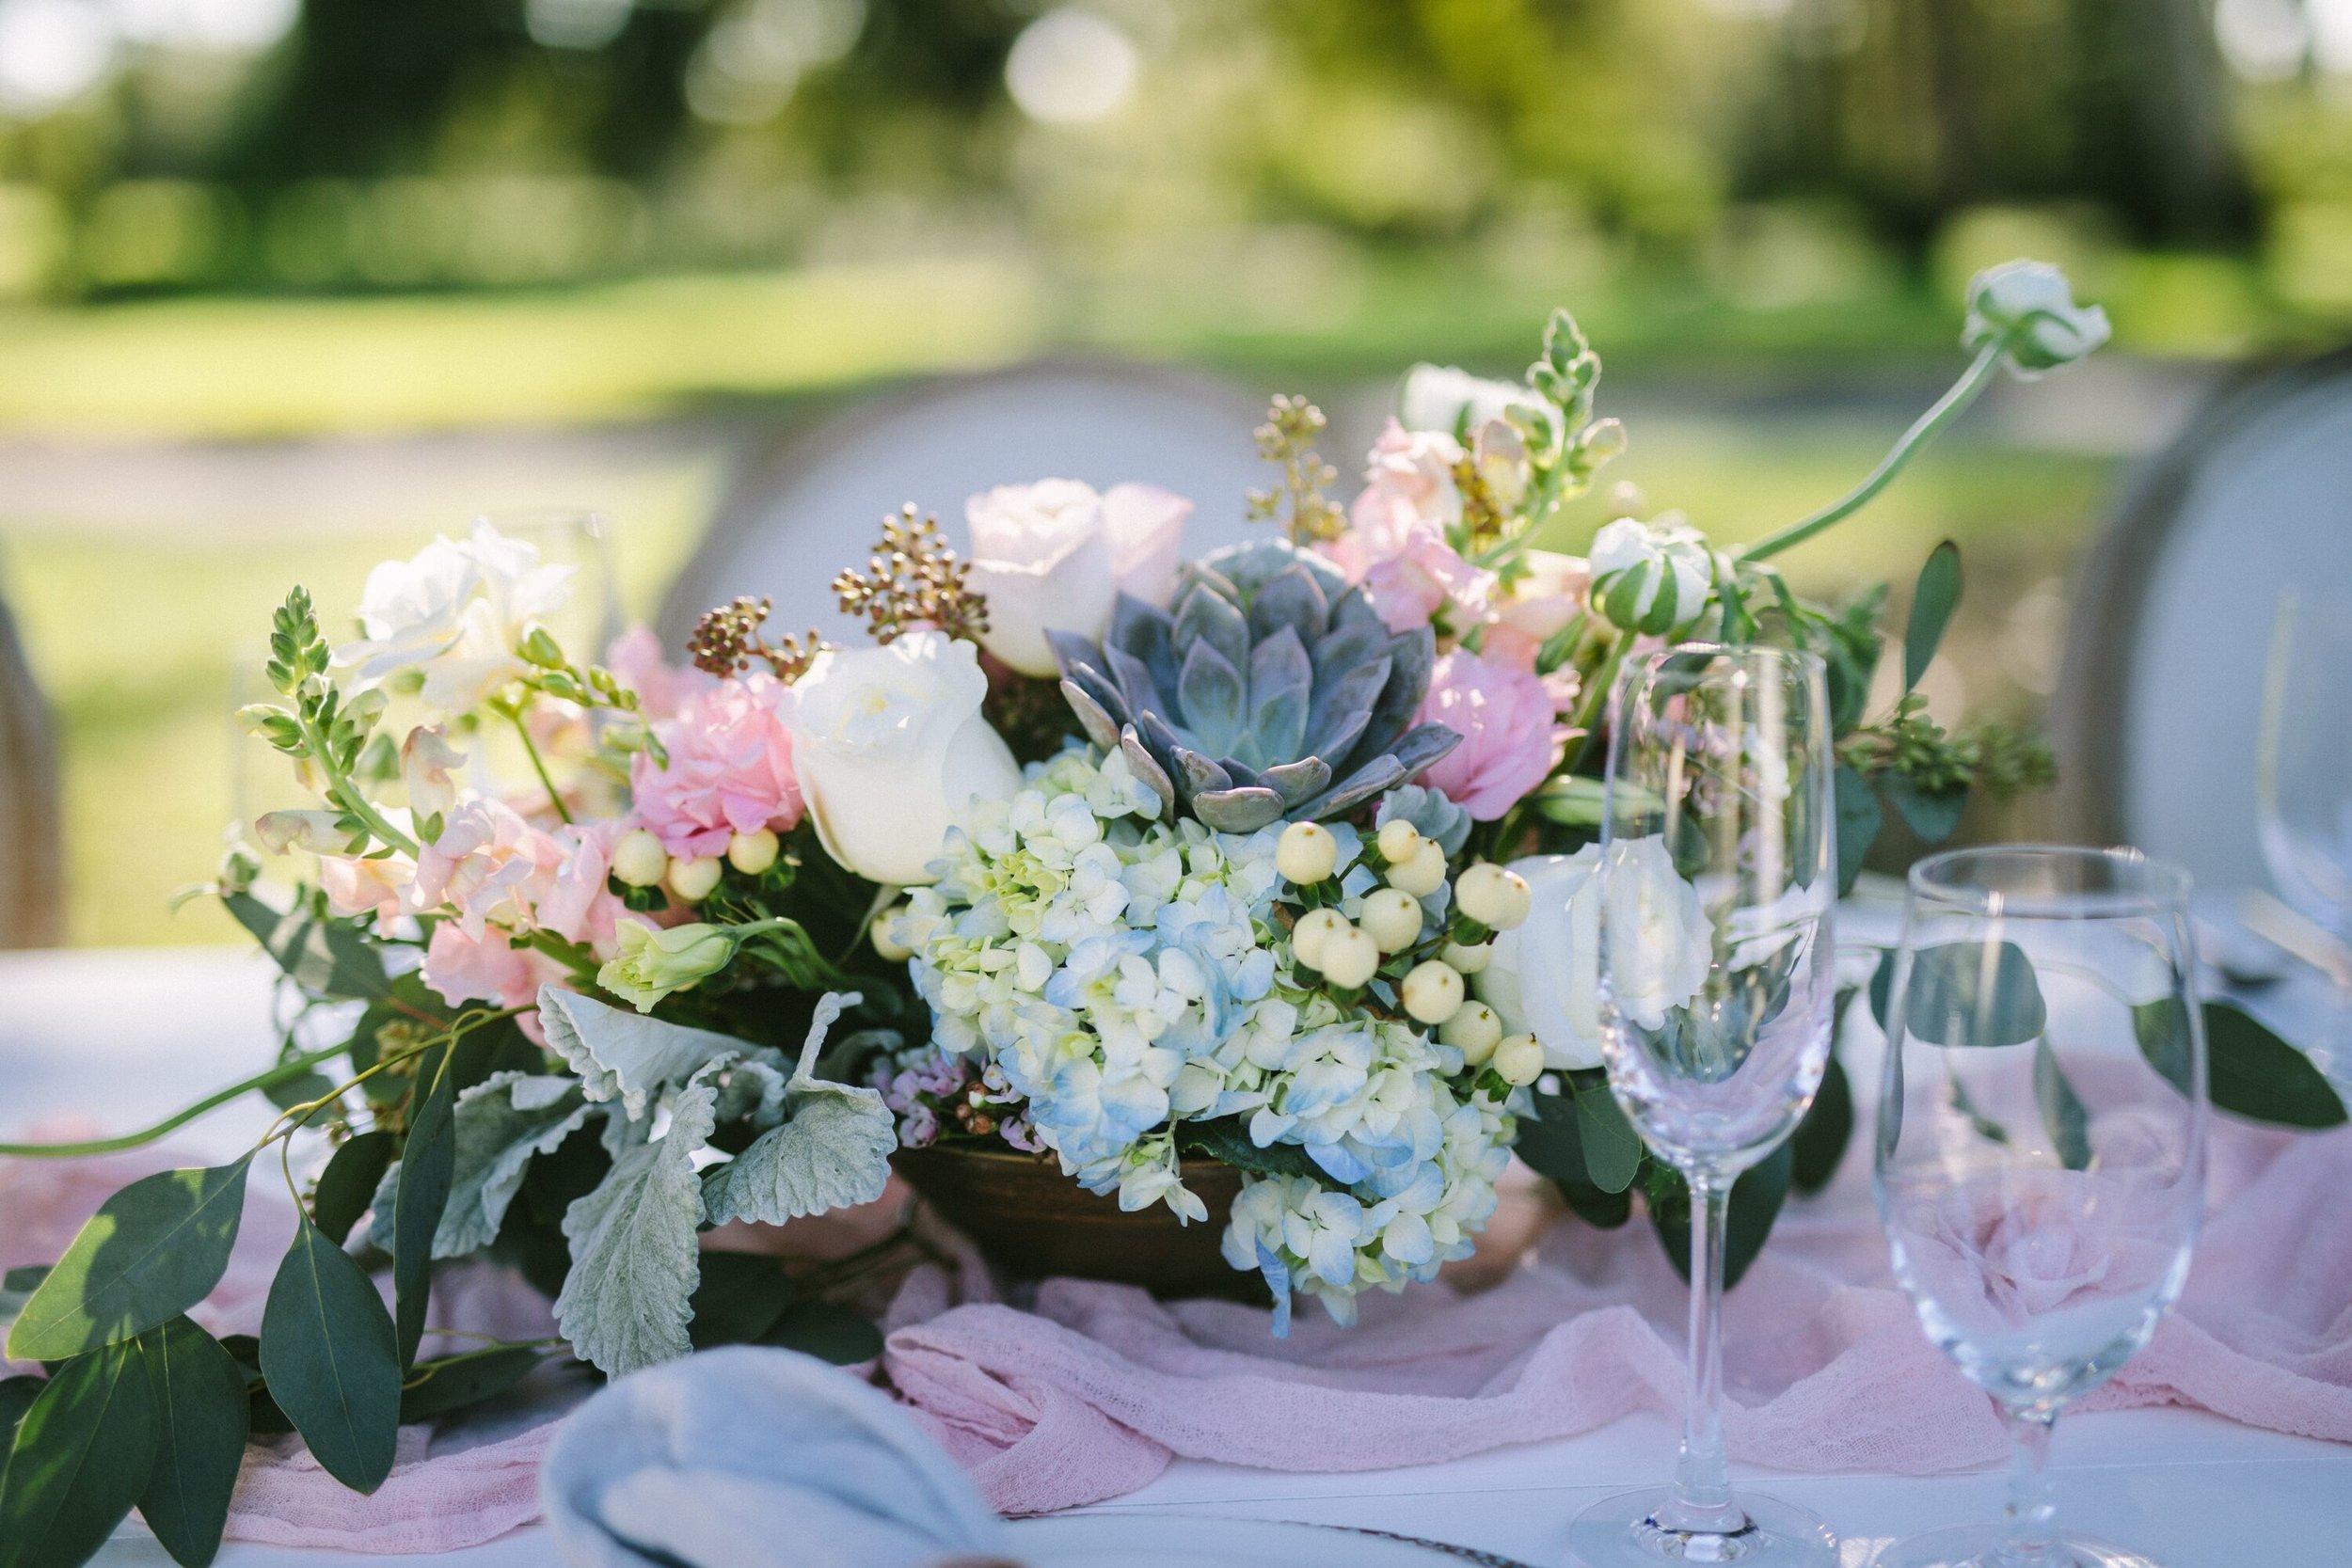 www.santabarbarawedding.com | Photographer: Patrick Ang | Venue: Rancho La Patera & Stow House | Wedding Planner: Elyse Rowen of Elyse Events | Tablescape